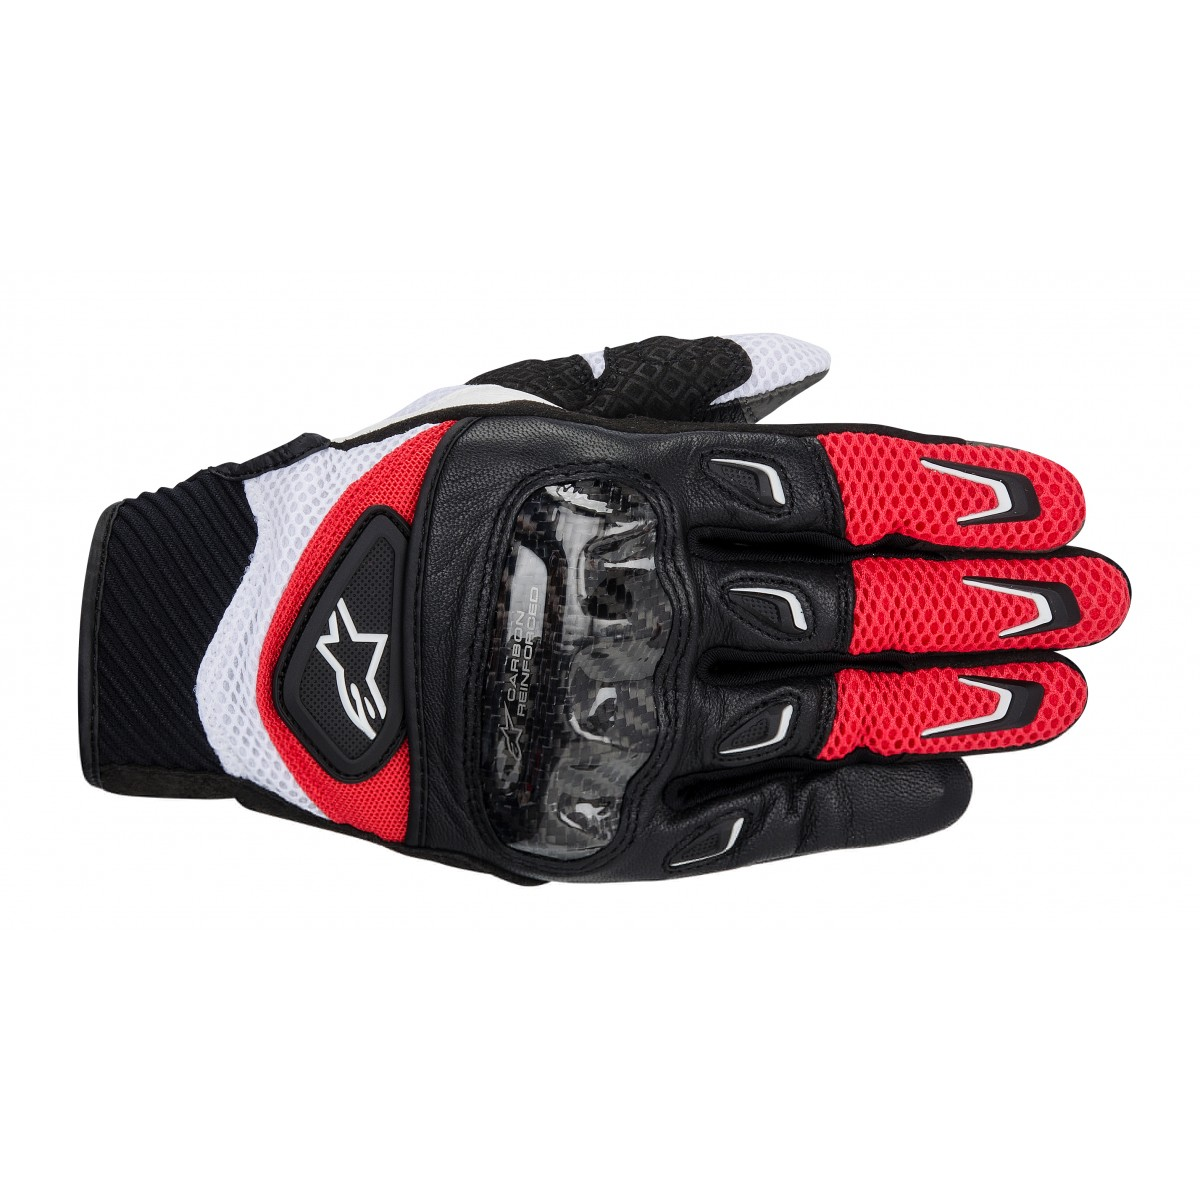 Luva Alpinestars SMX-2 Air Carbon (Vermelha/ Ventilada)  - Super Bike - Loja Oficial Alpinestars